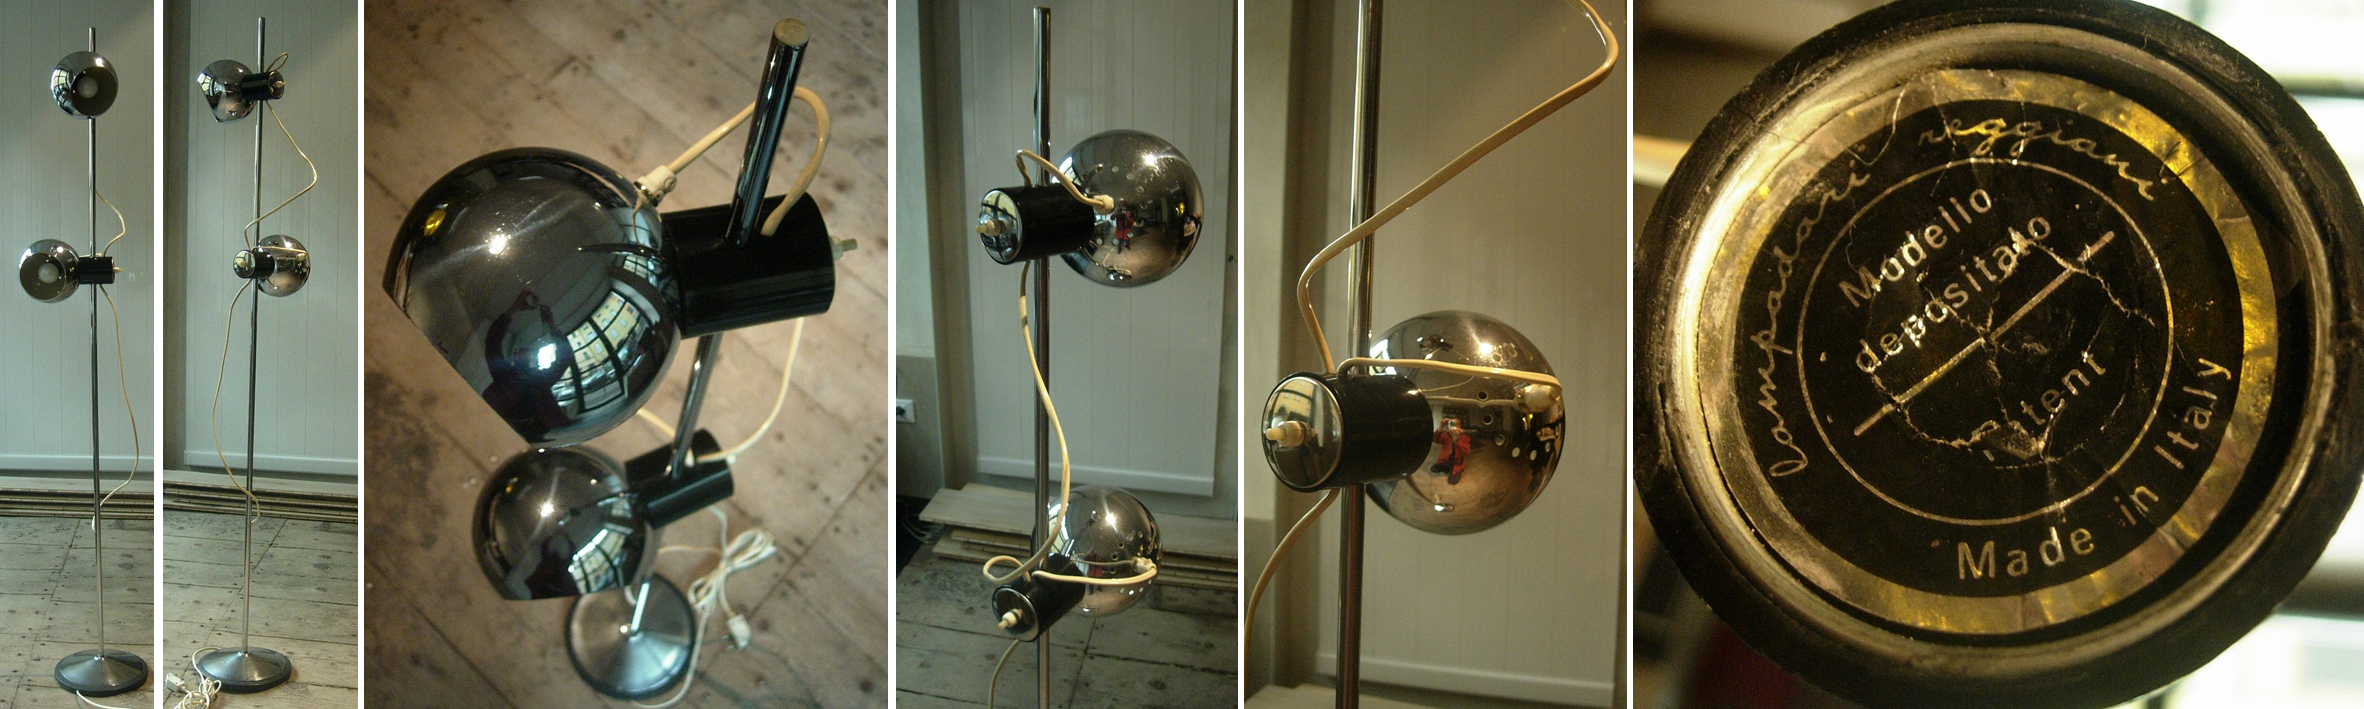 900 design LIGHTINGS 900 design modernariato design classic modernist design ...